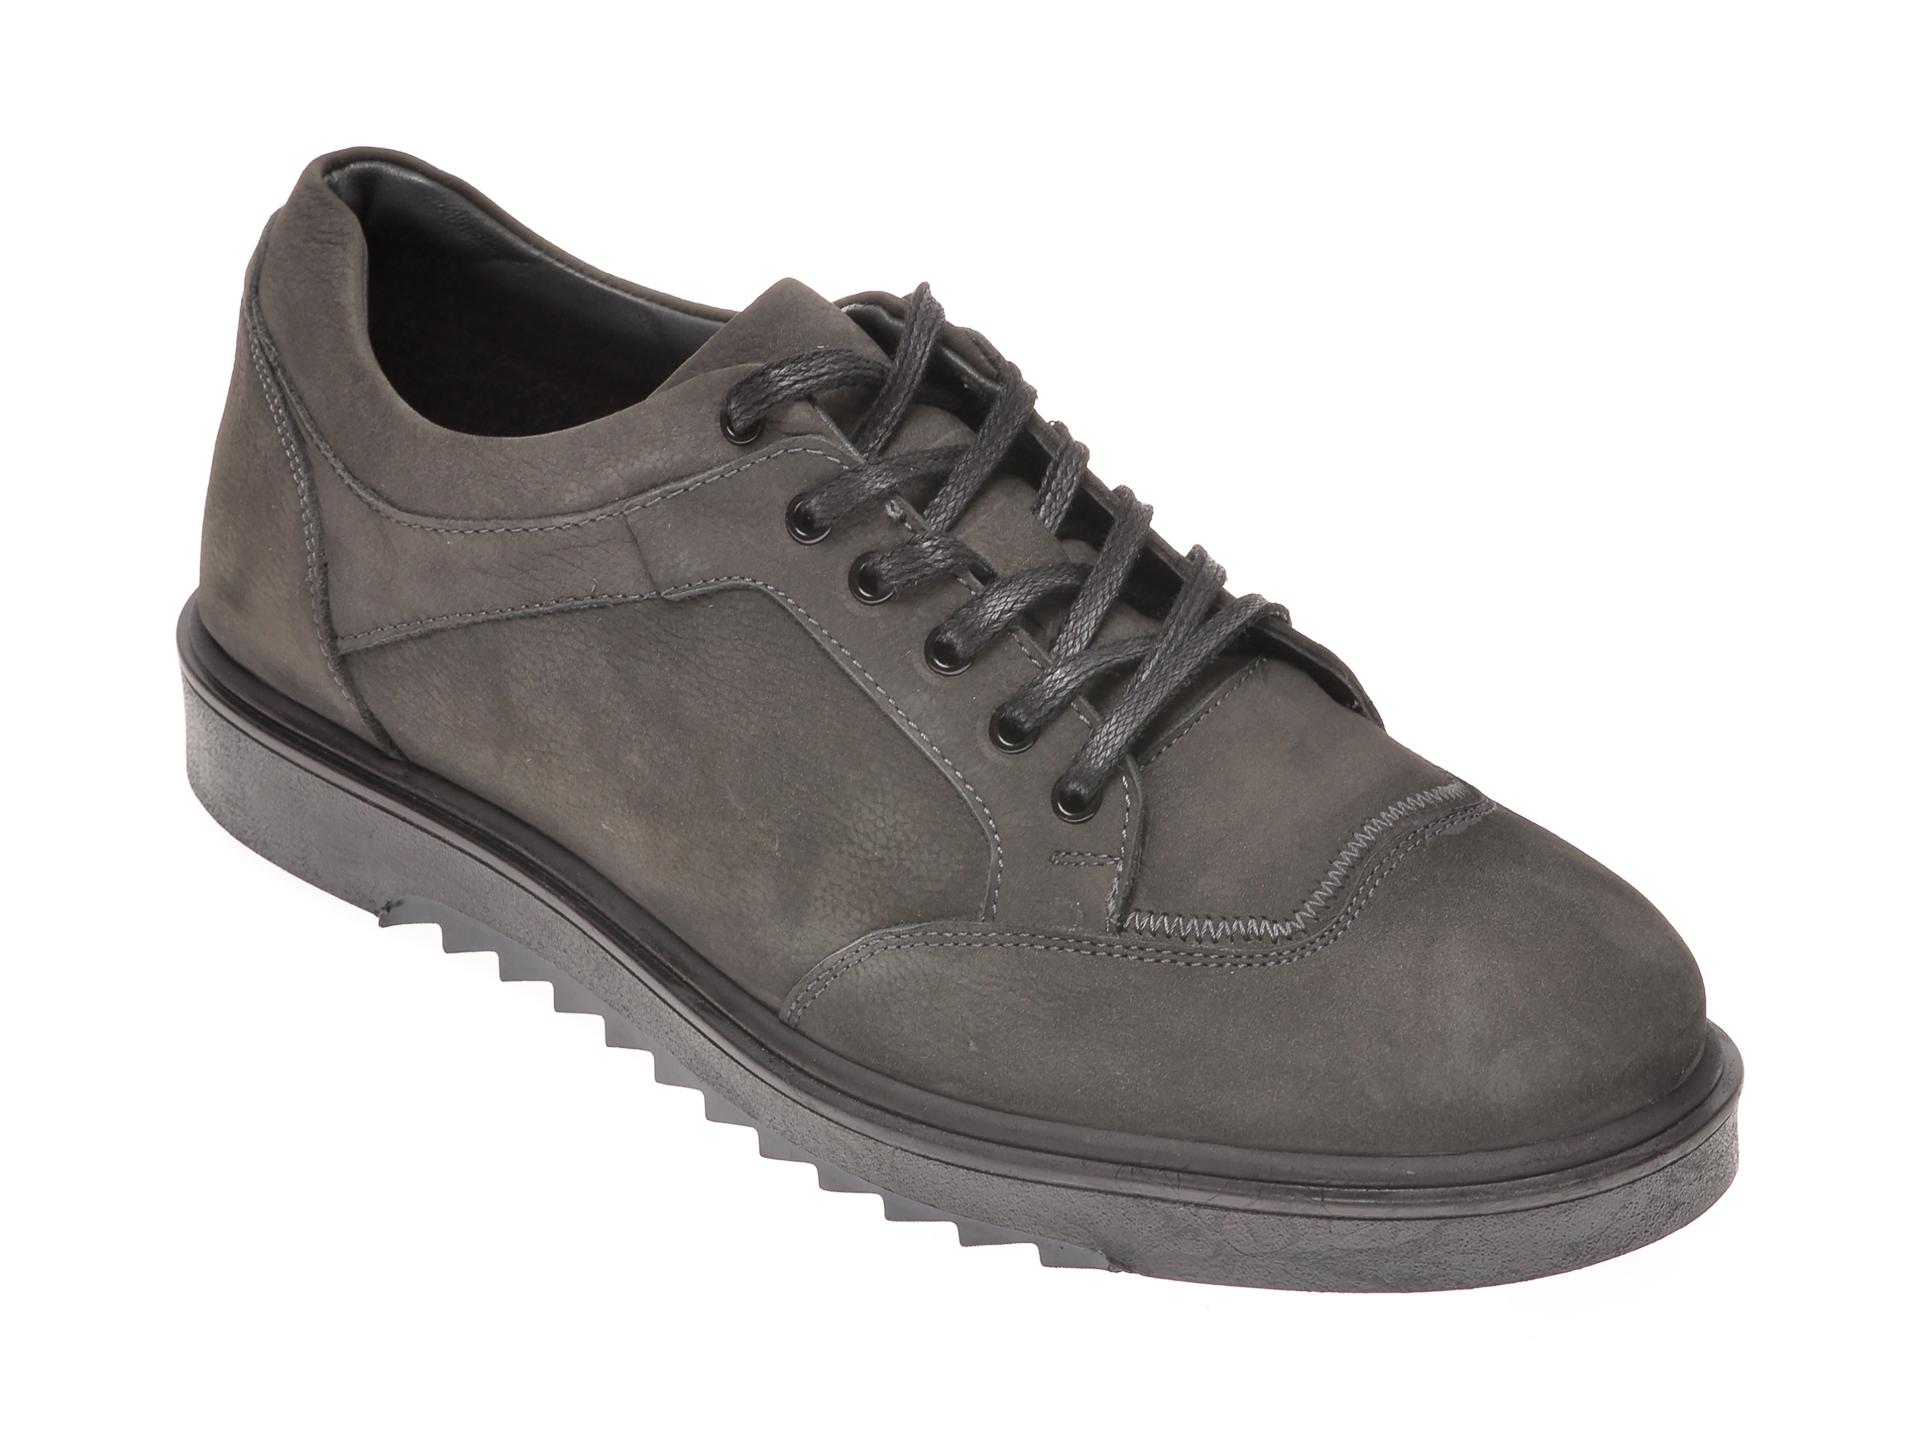 Pantofi OTTER gri, P0312, din nabuc imagine